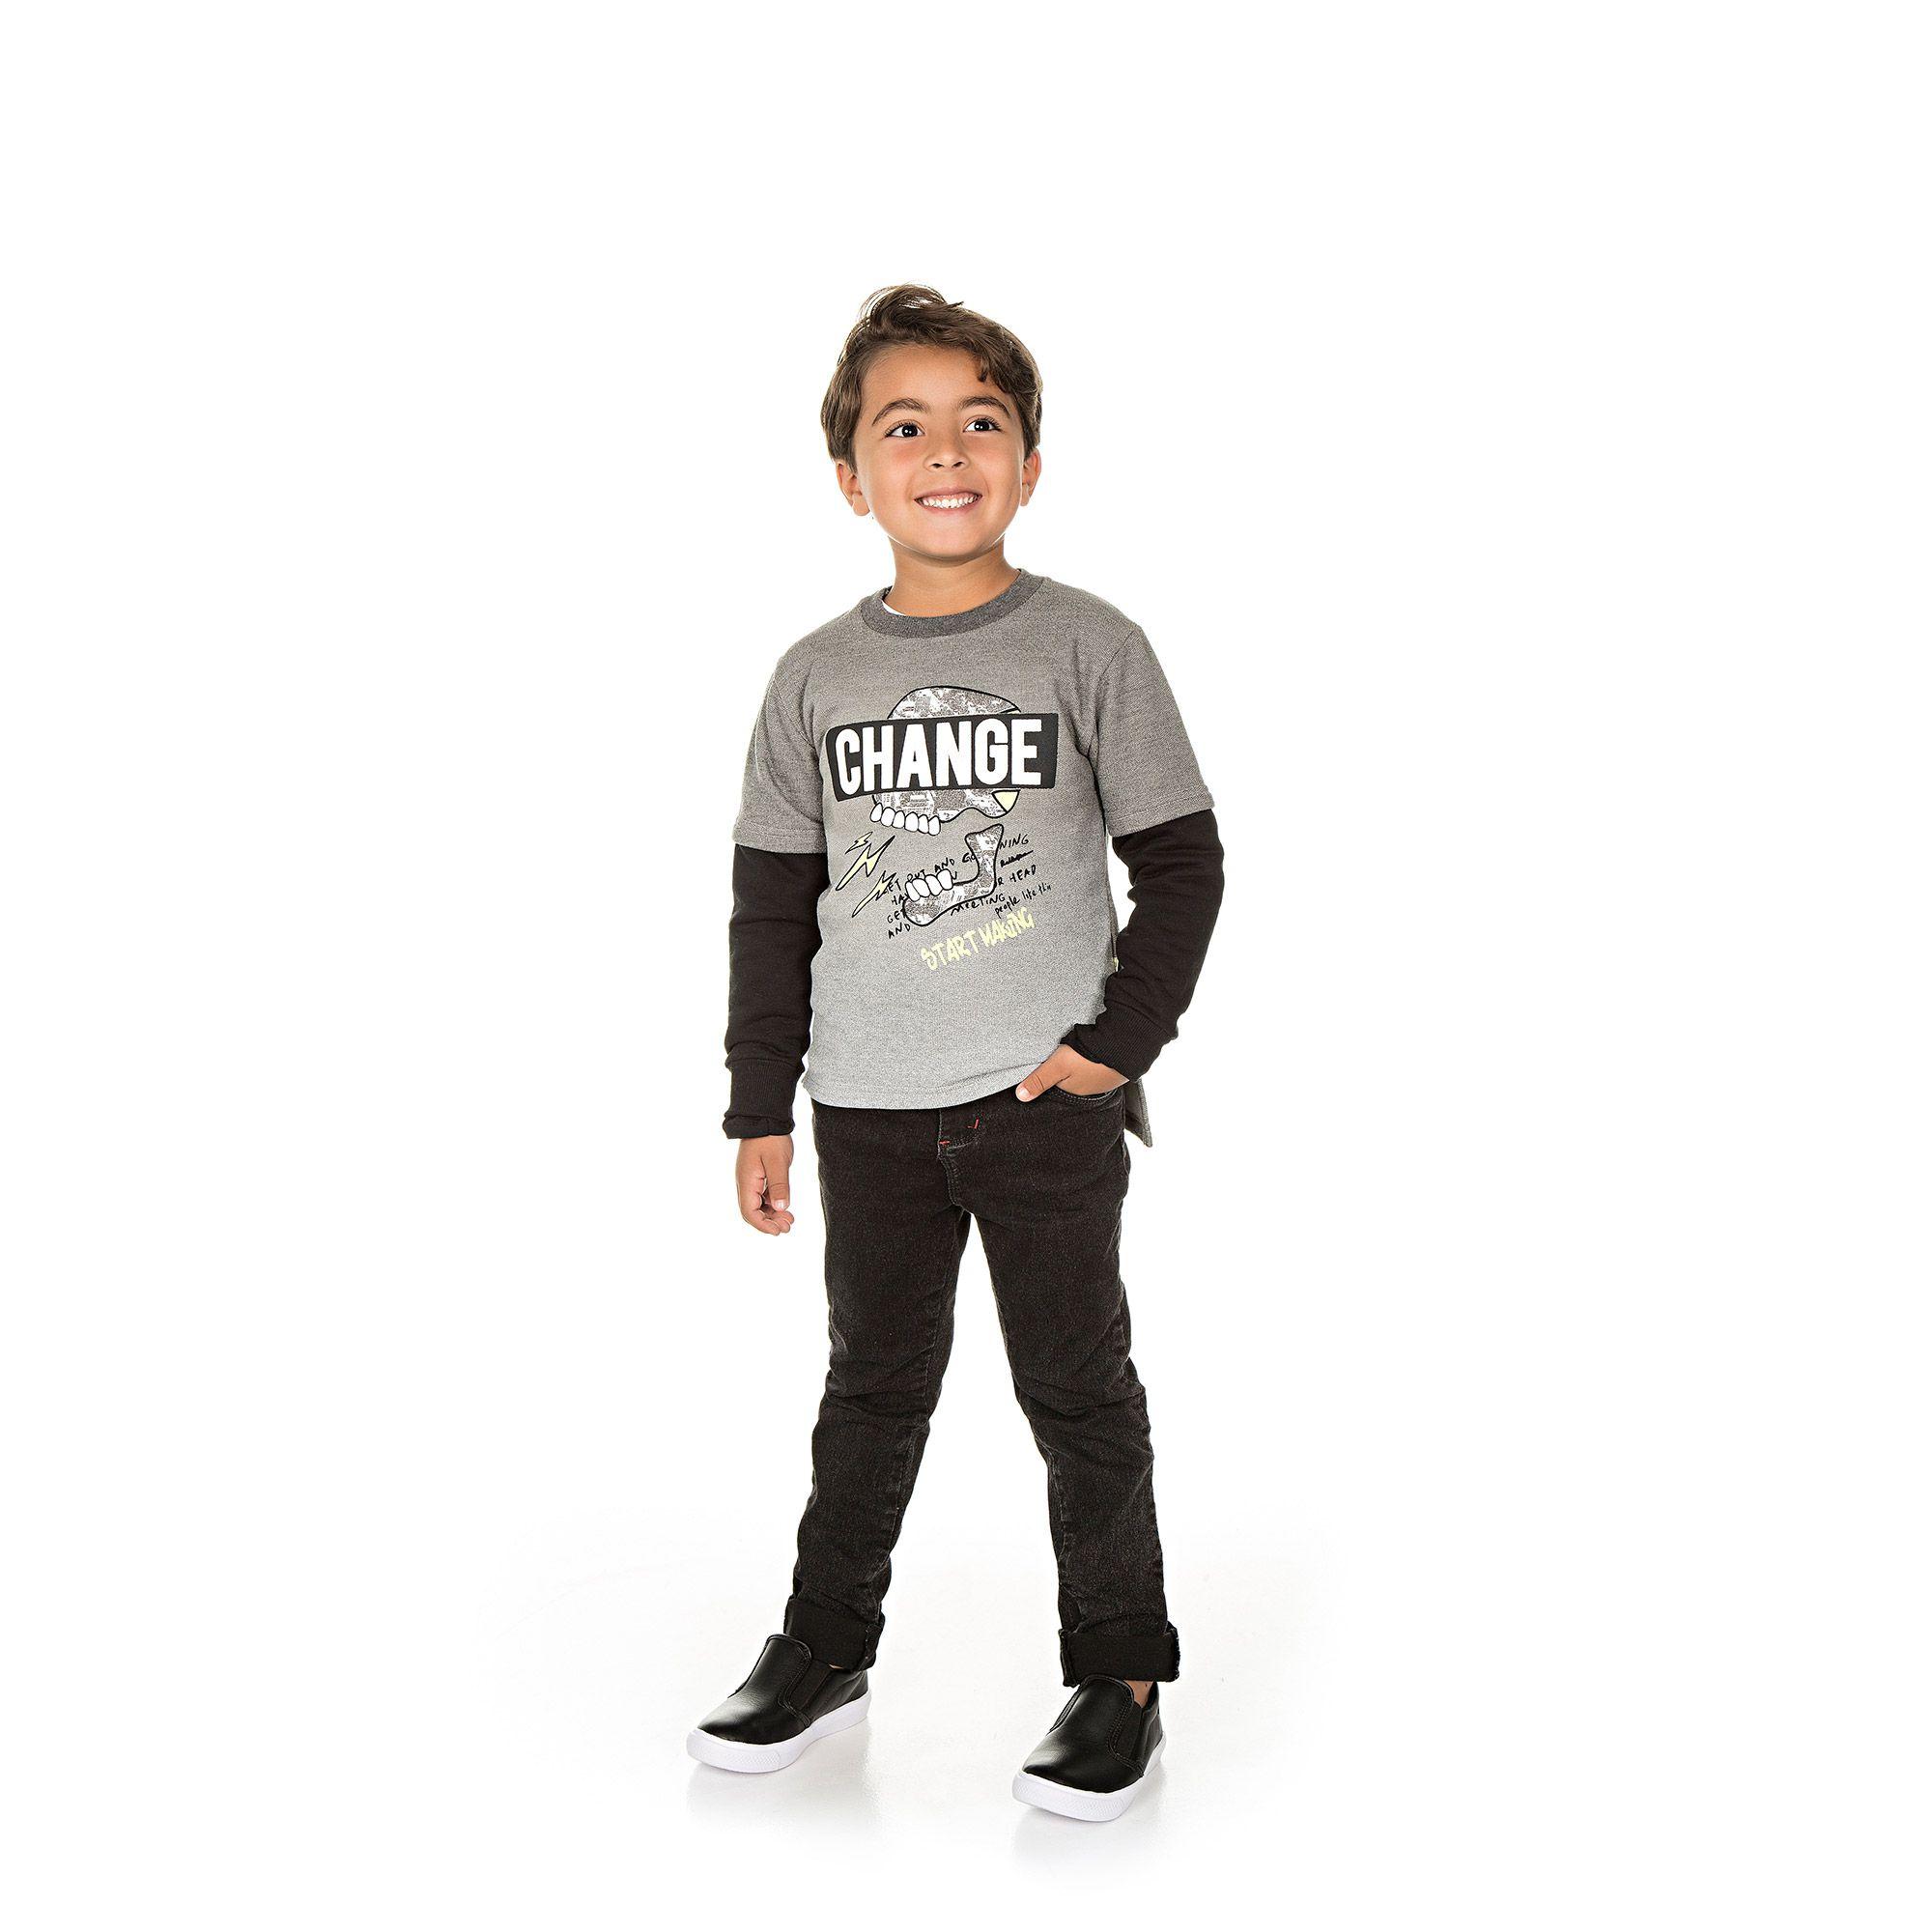 Casaco Infantil Masculino  - Ref 5027 - Mescla